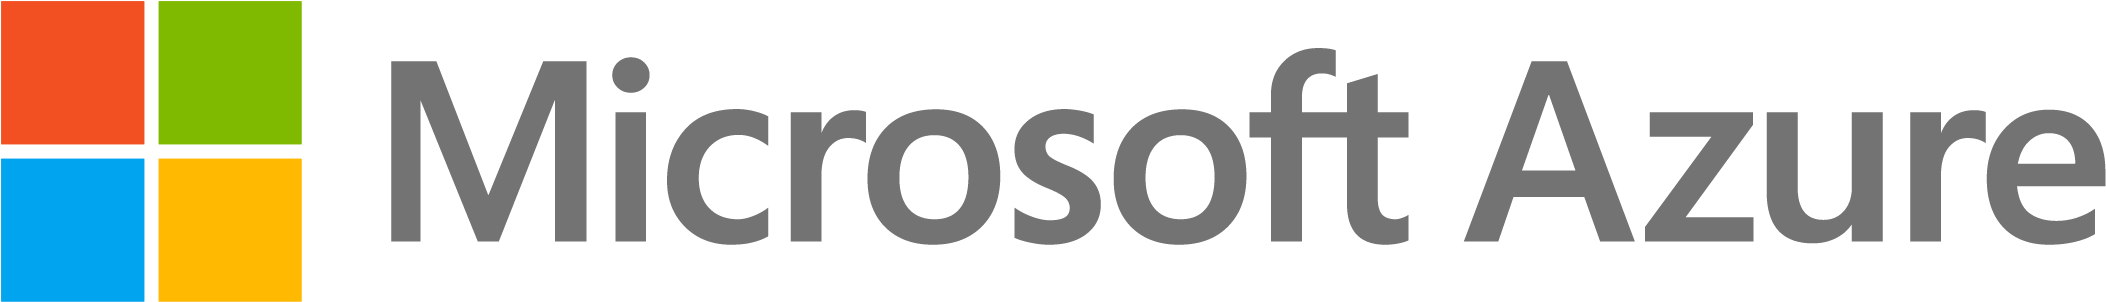 Microsoft-Azure-Vlan